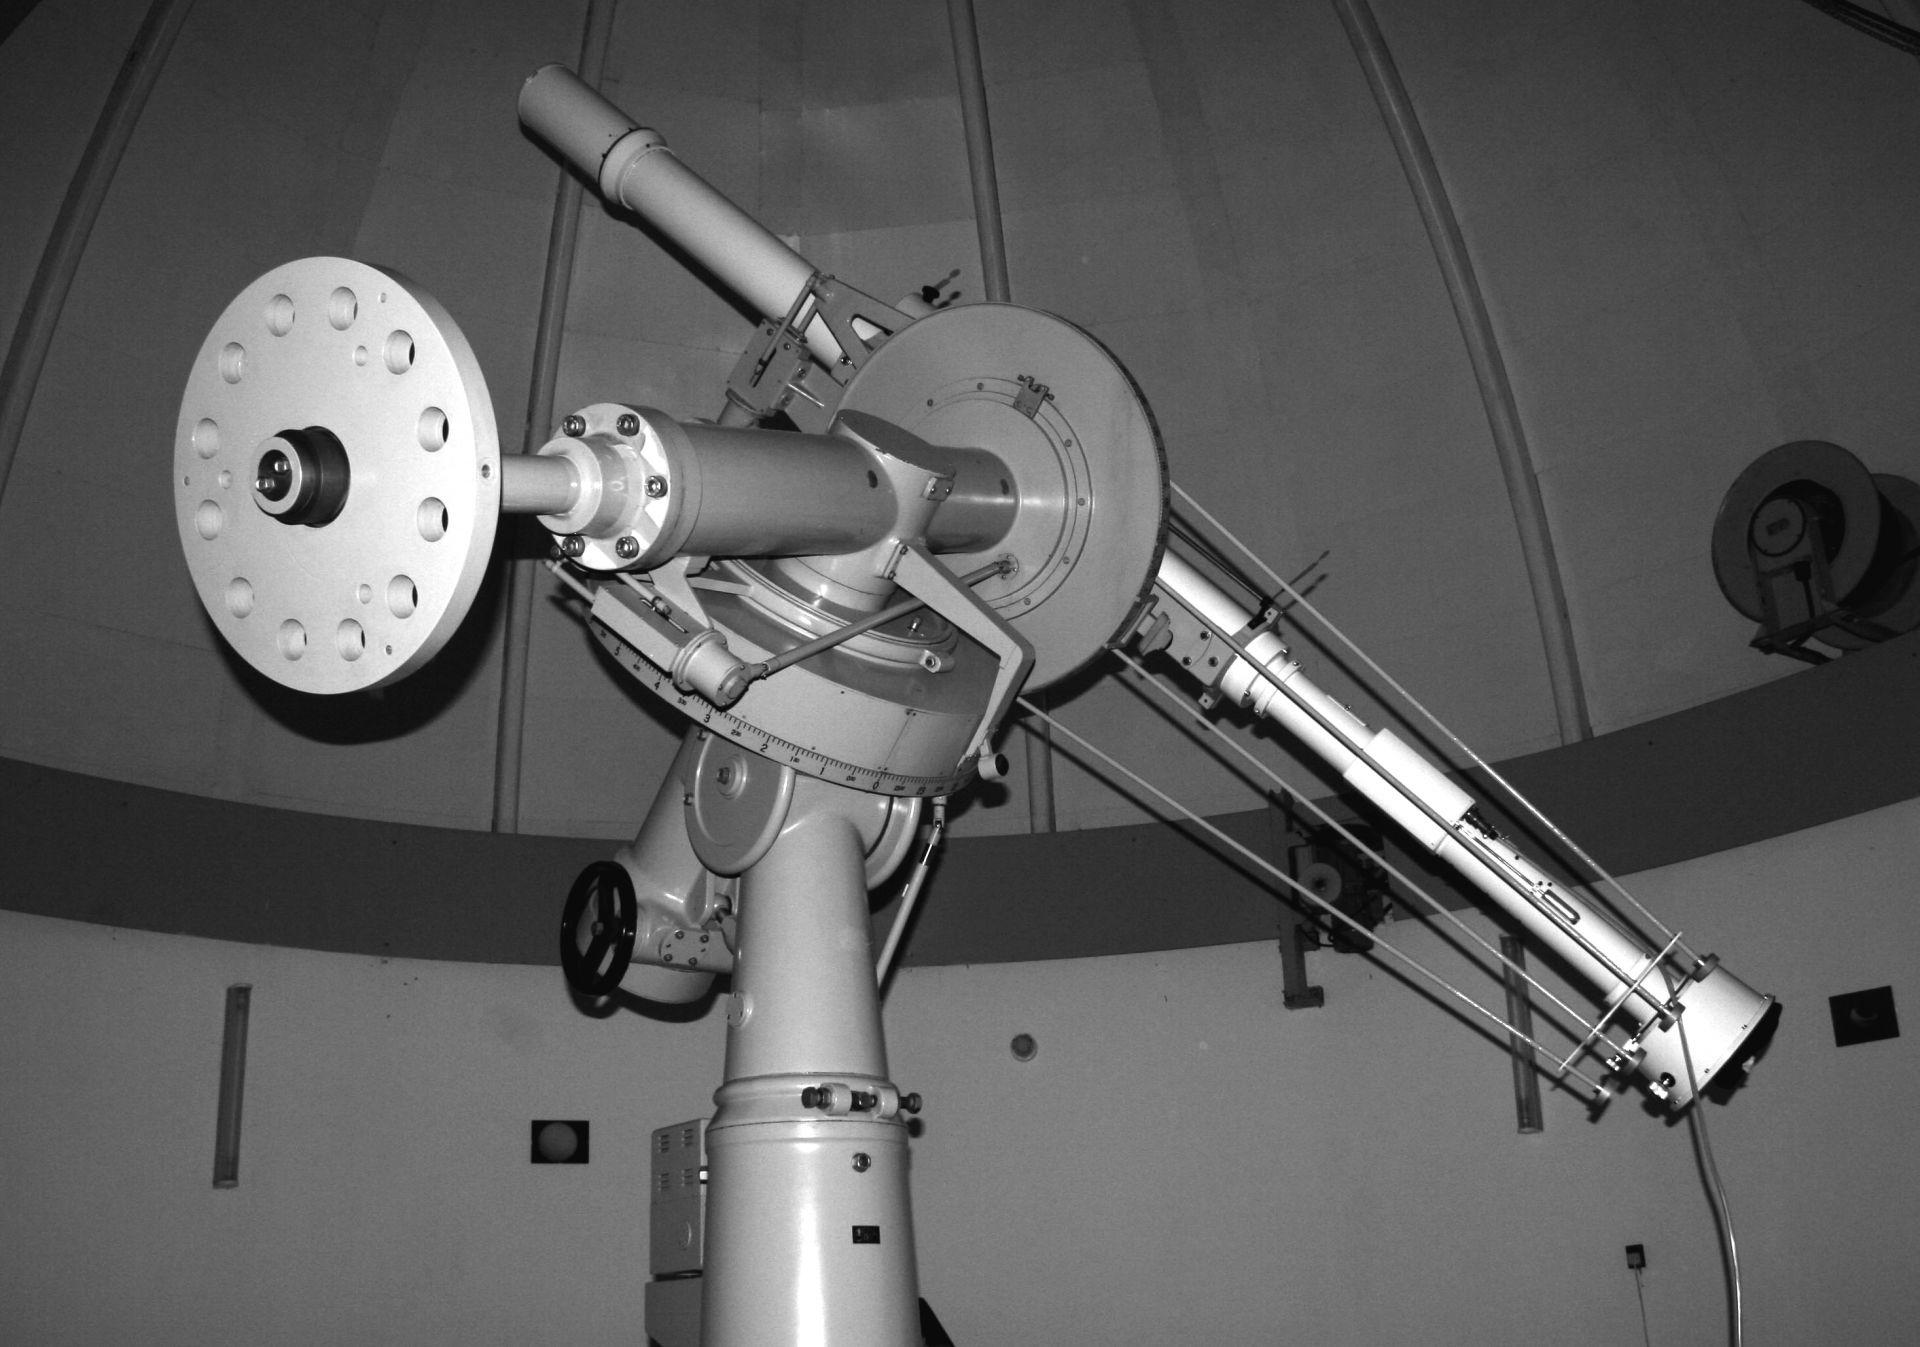 15-см слънчев телескоп-коронограф в Национална астрономическа обсерватория Рожен